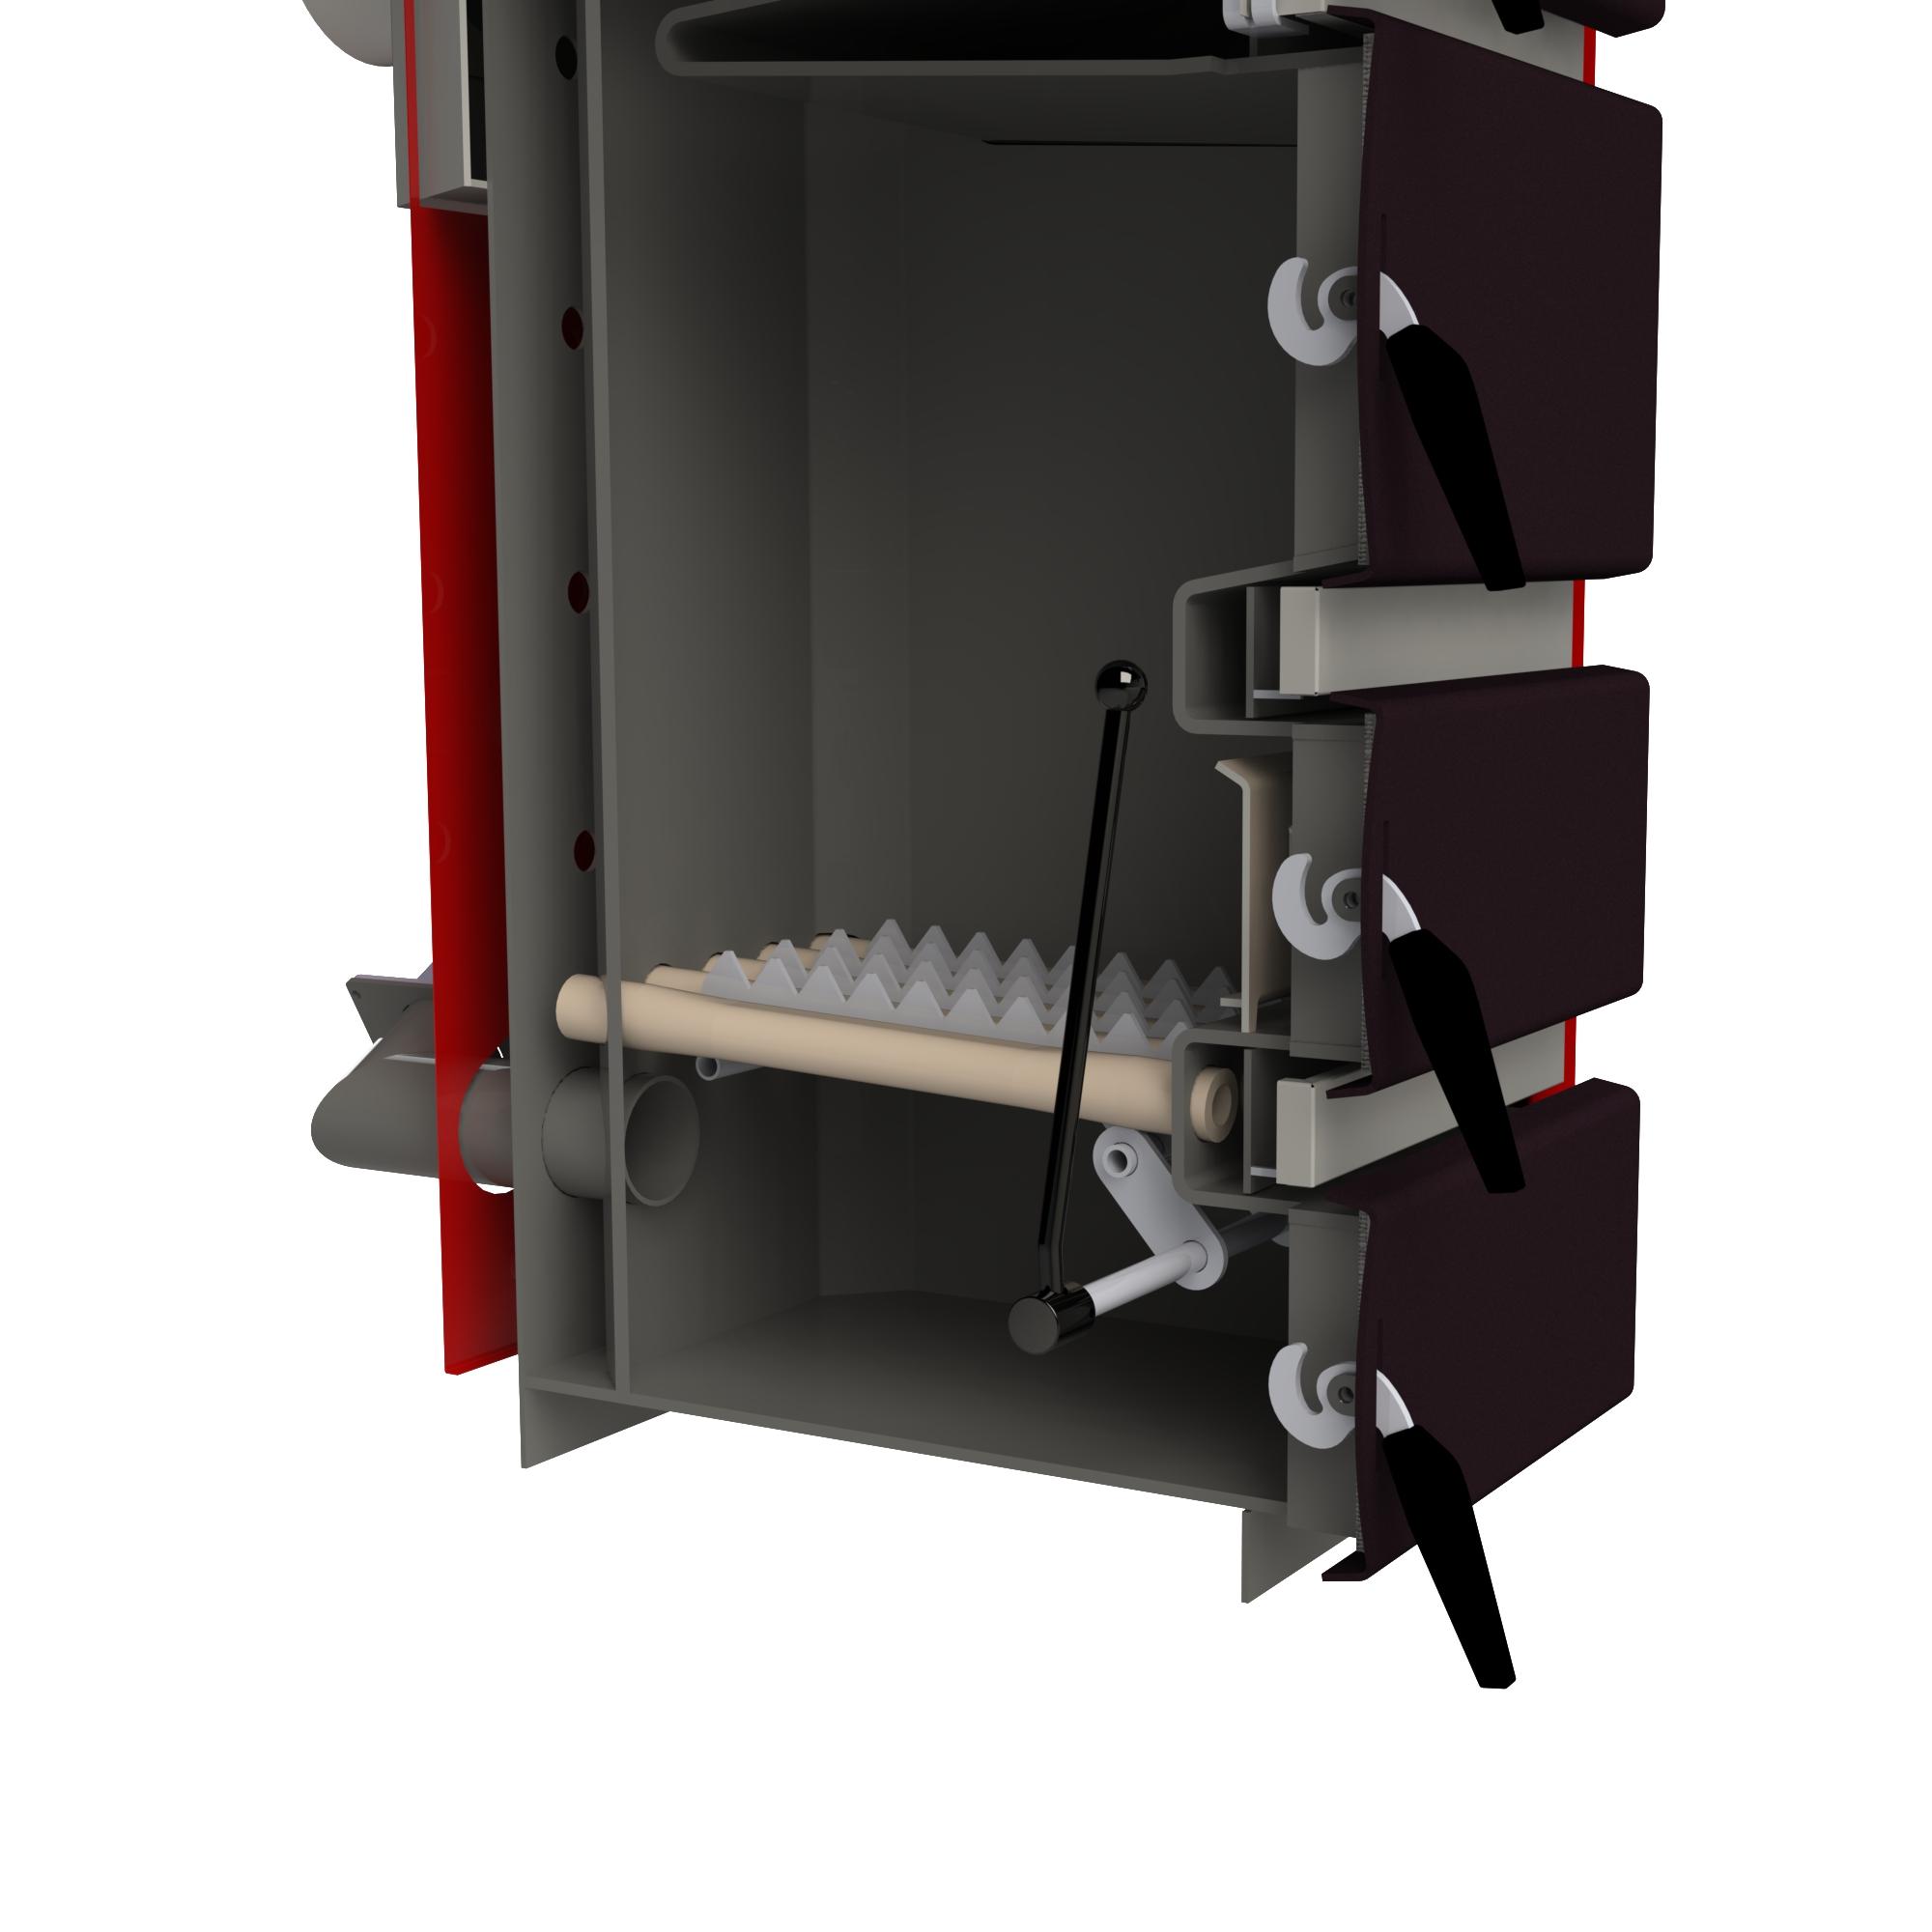 Твердотопливный котел Elektromet EKO-KWW Strong 14 фото3